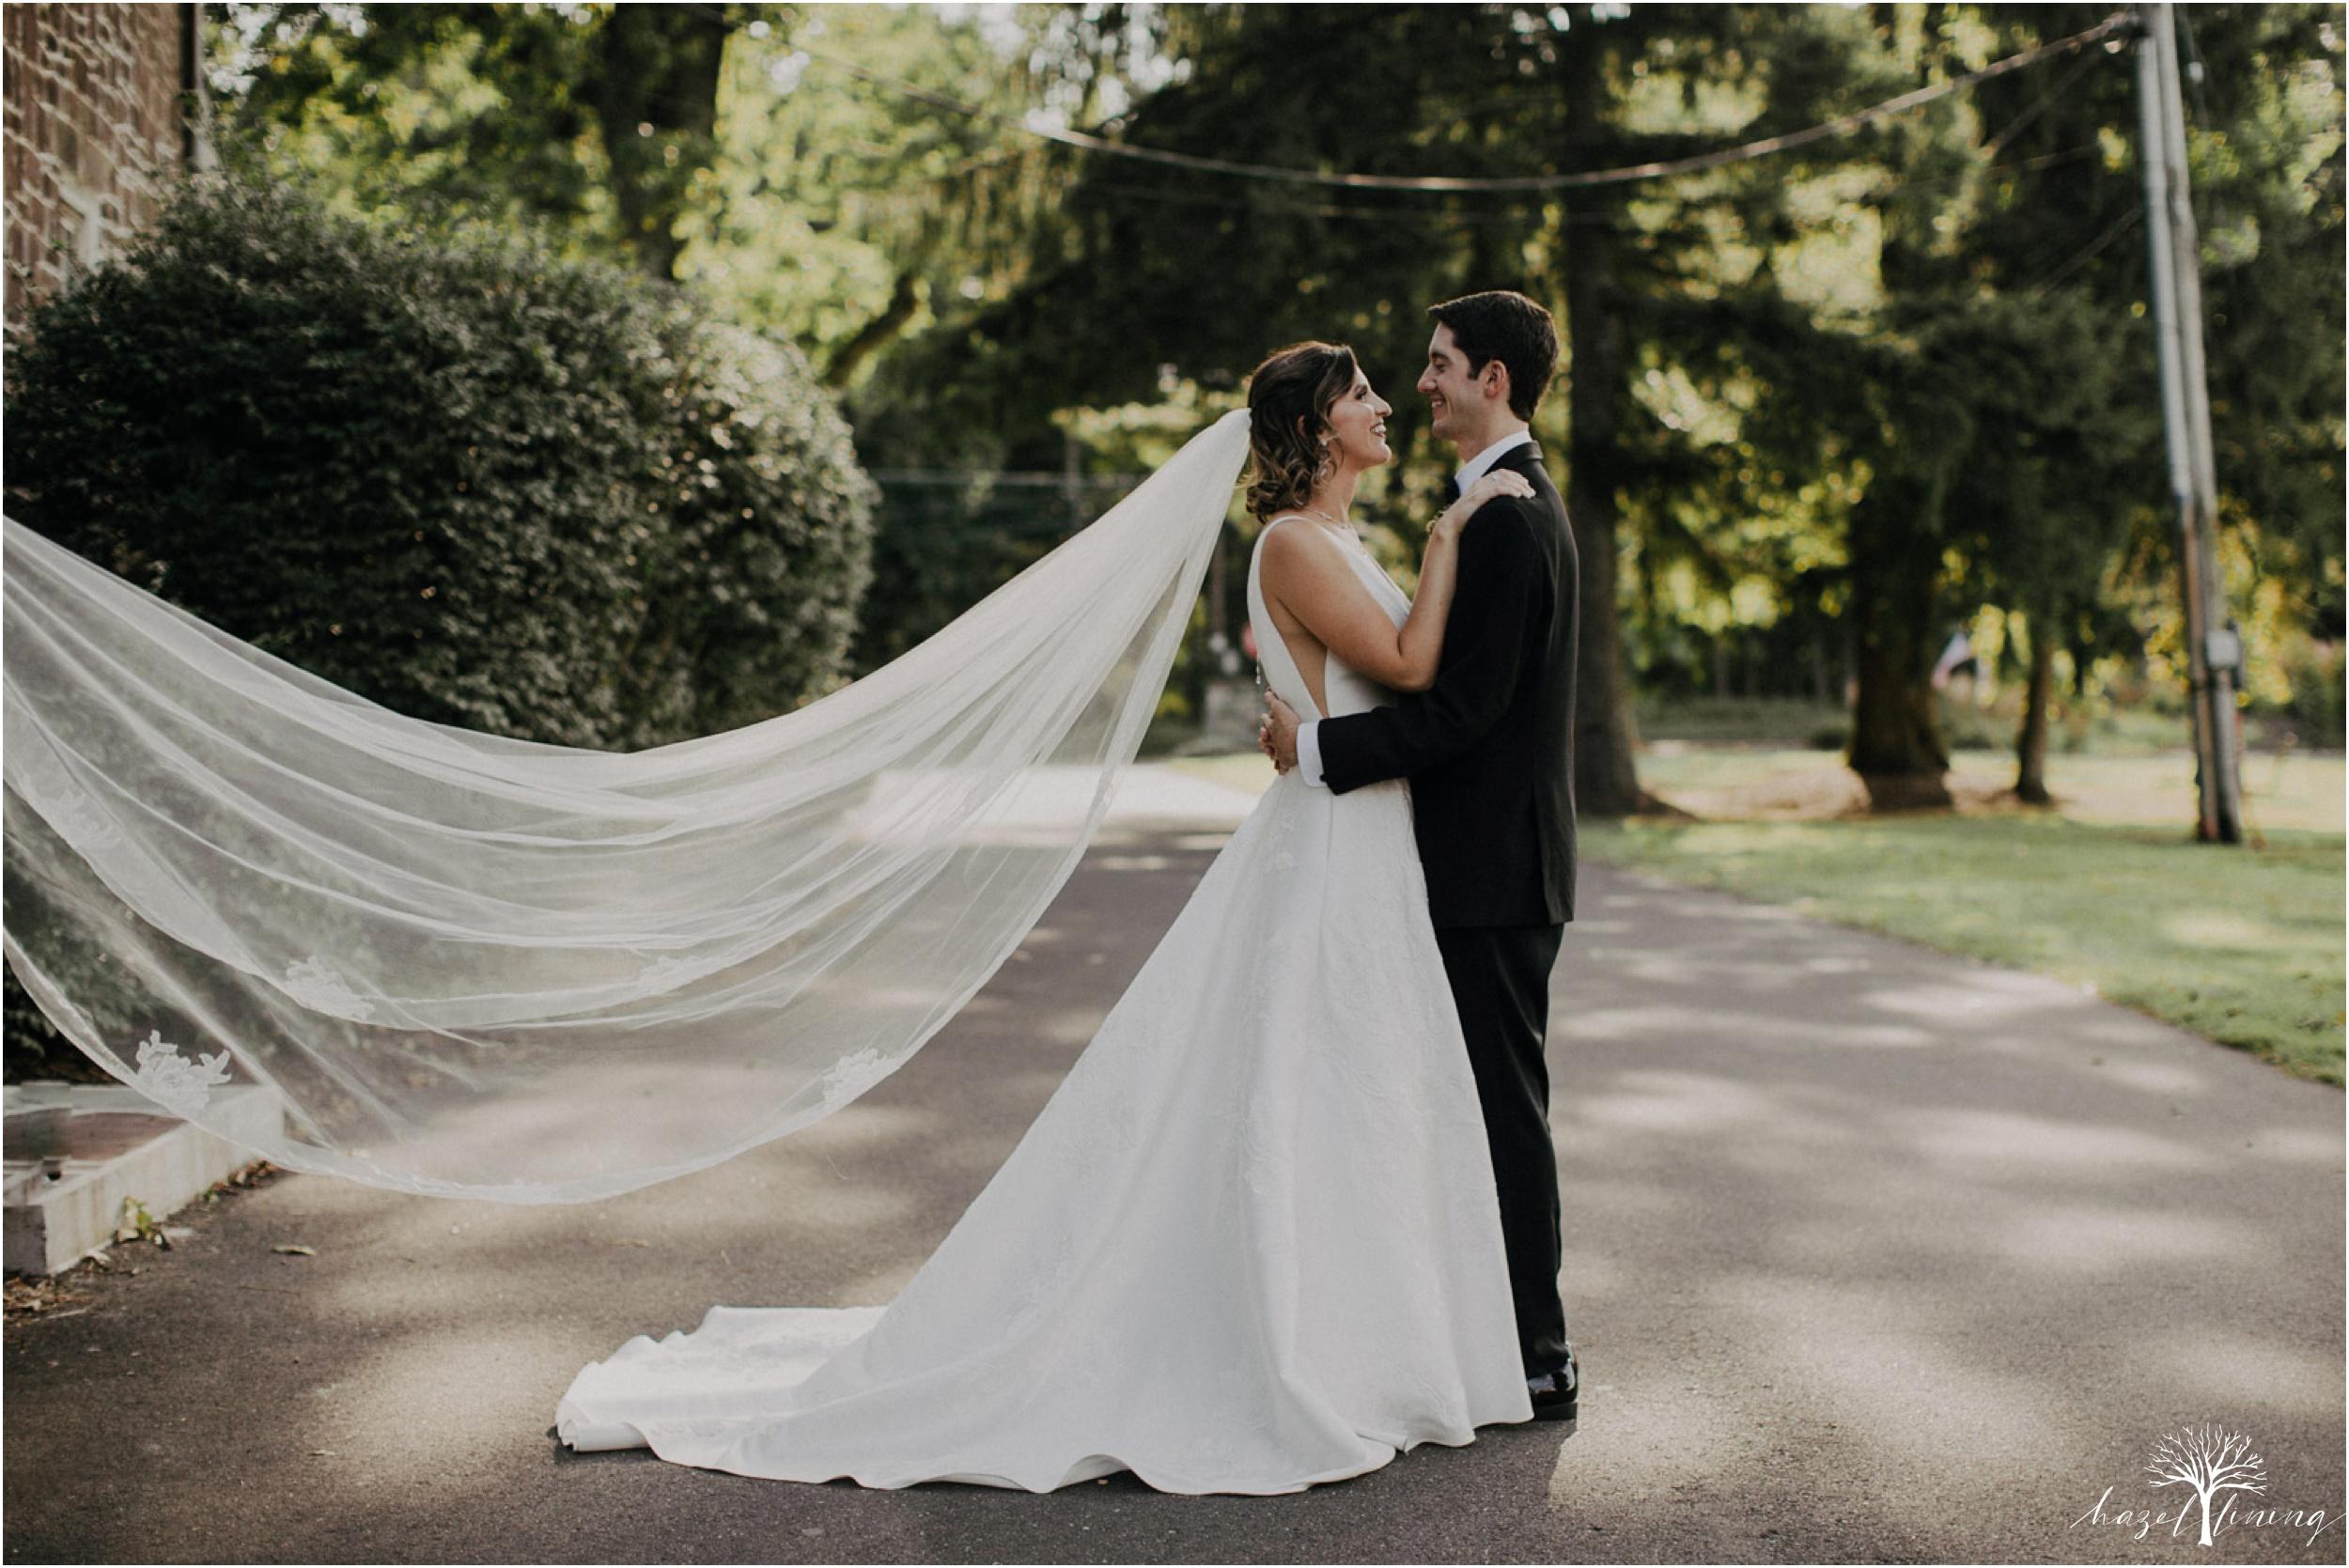 maureen-hepner-anthony-giordano-rose-bank-winery-newtow-pennsylvania-luxury-summer-wedding-hazel-lining-photography-destination-elopement-wedding-engagement-photography_0092.jpg